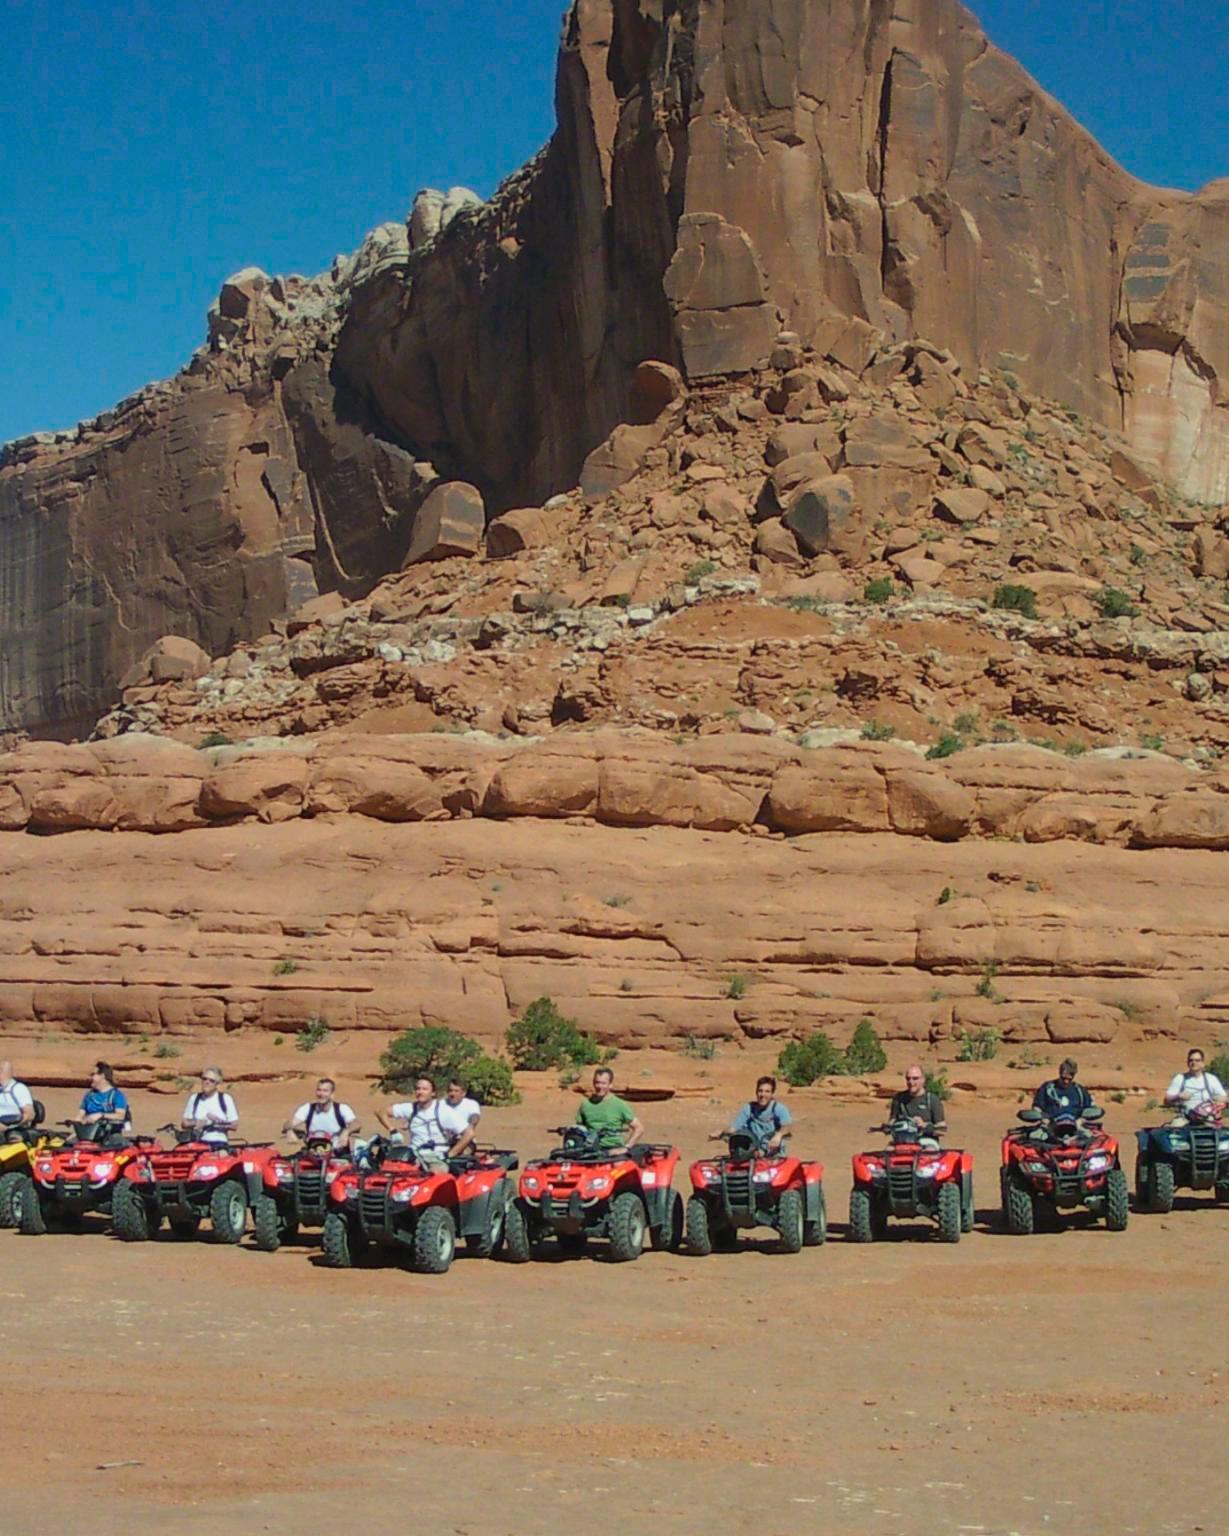 bachelor-party-trip-moab-mountain-four-wheeling-0315.jpg